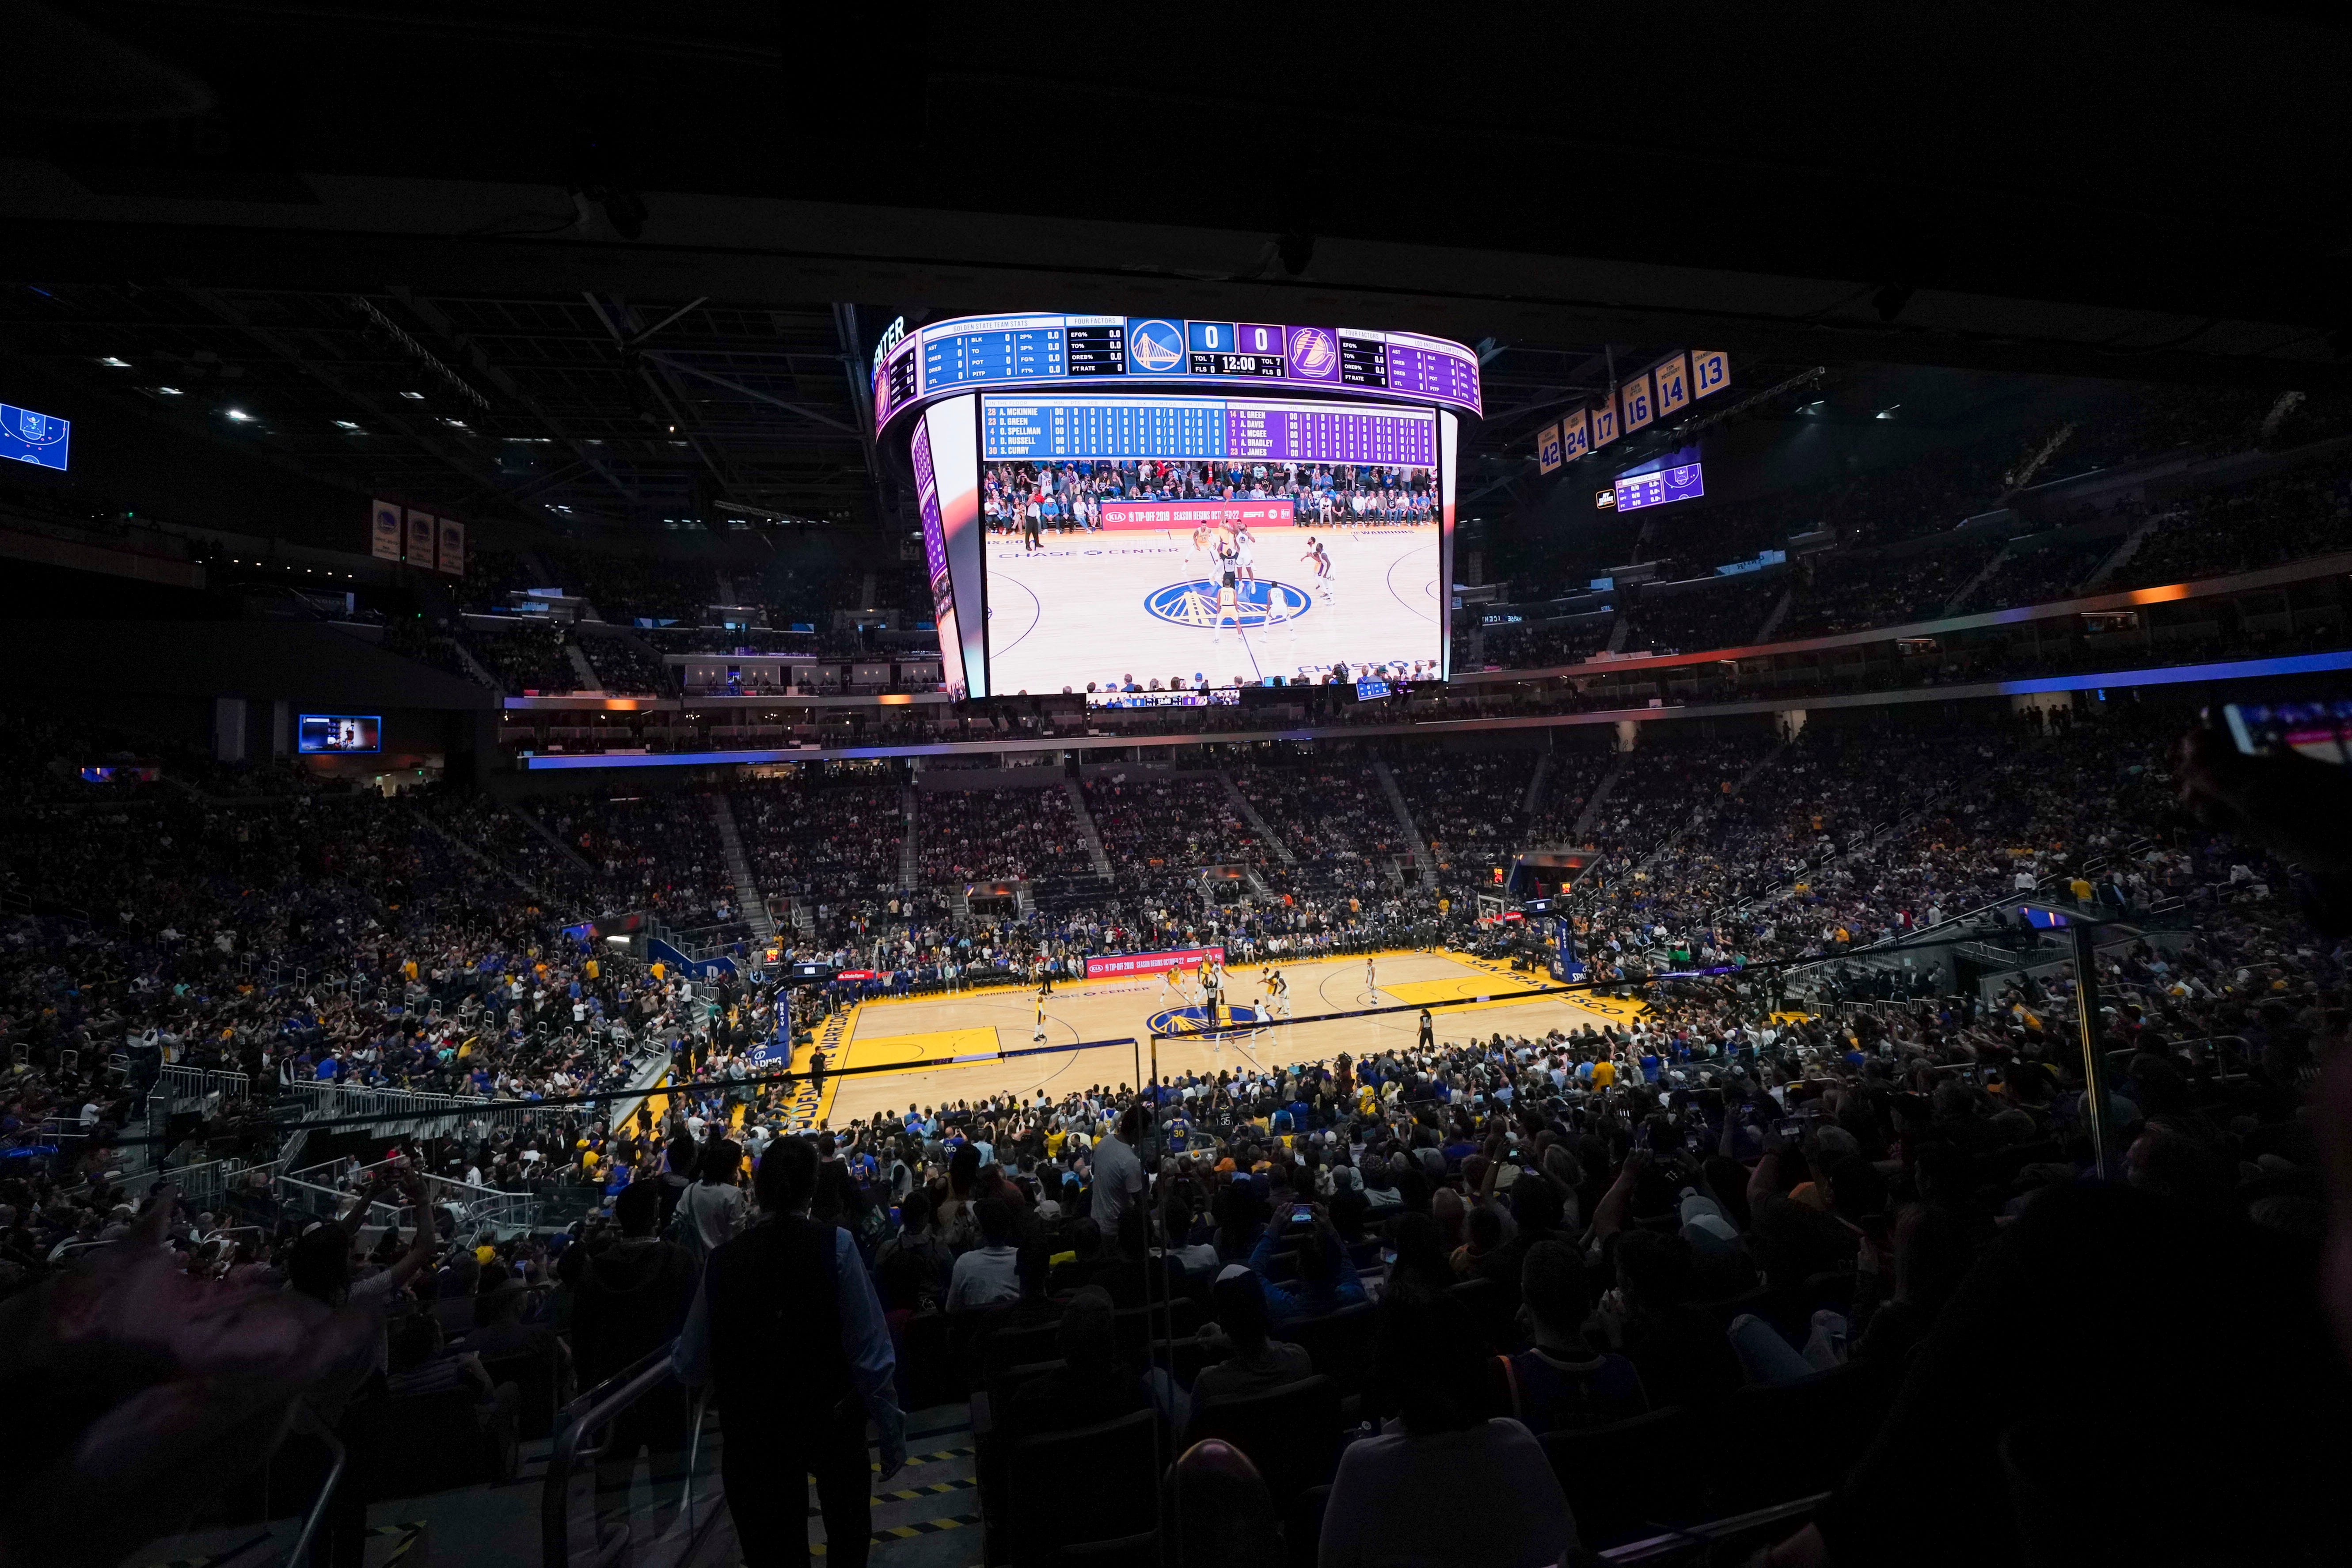 Warriors organization pledges $1 million to aid arena employees during coronavirus shutdown